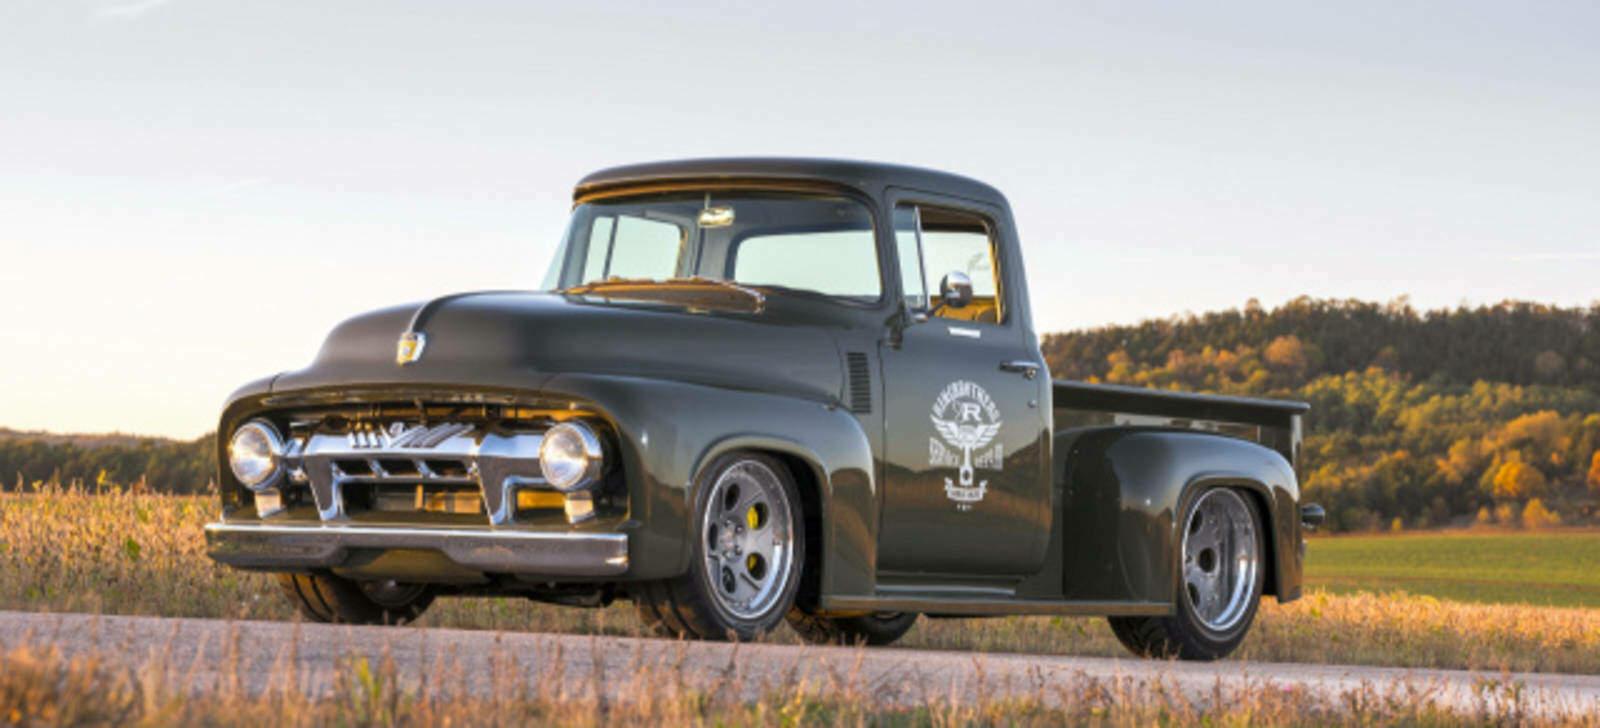 ringbrothers-1956-ford-f100-pickup-clem-101-3407.jpg